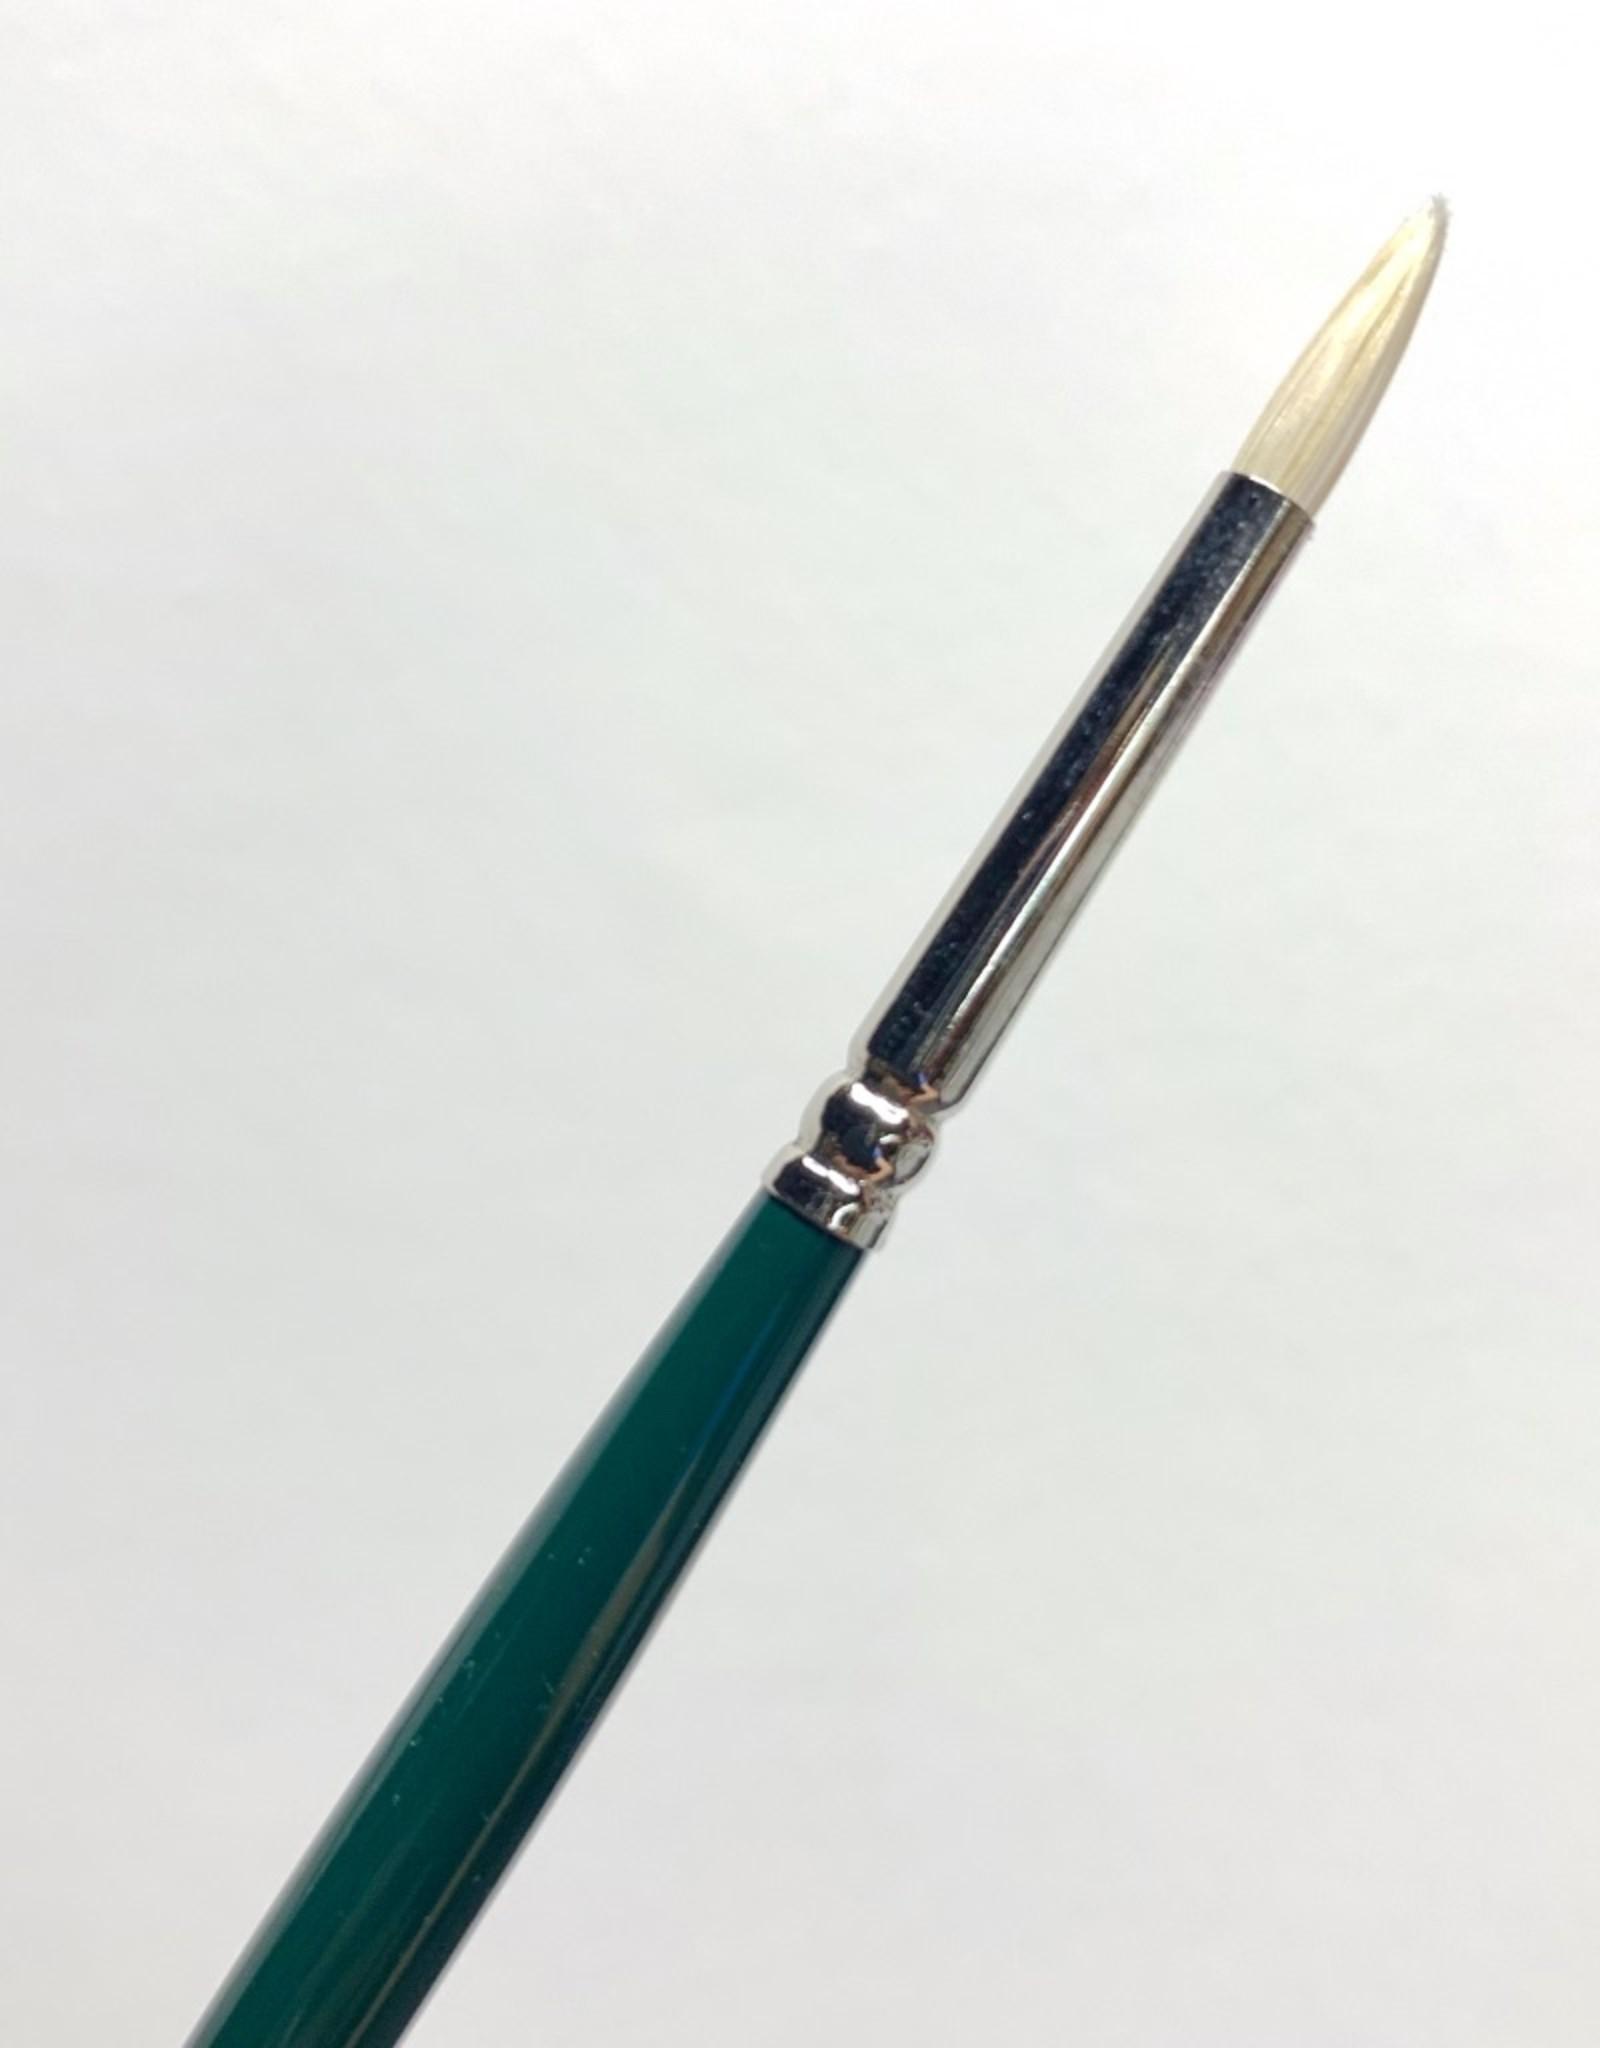 Winsor & Newton Brush, Round 1, Hog Hair for Oil or Acrylic Paint Bristle